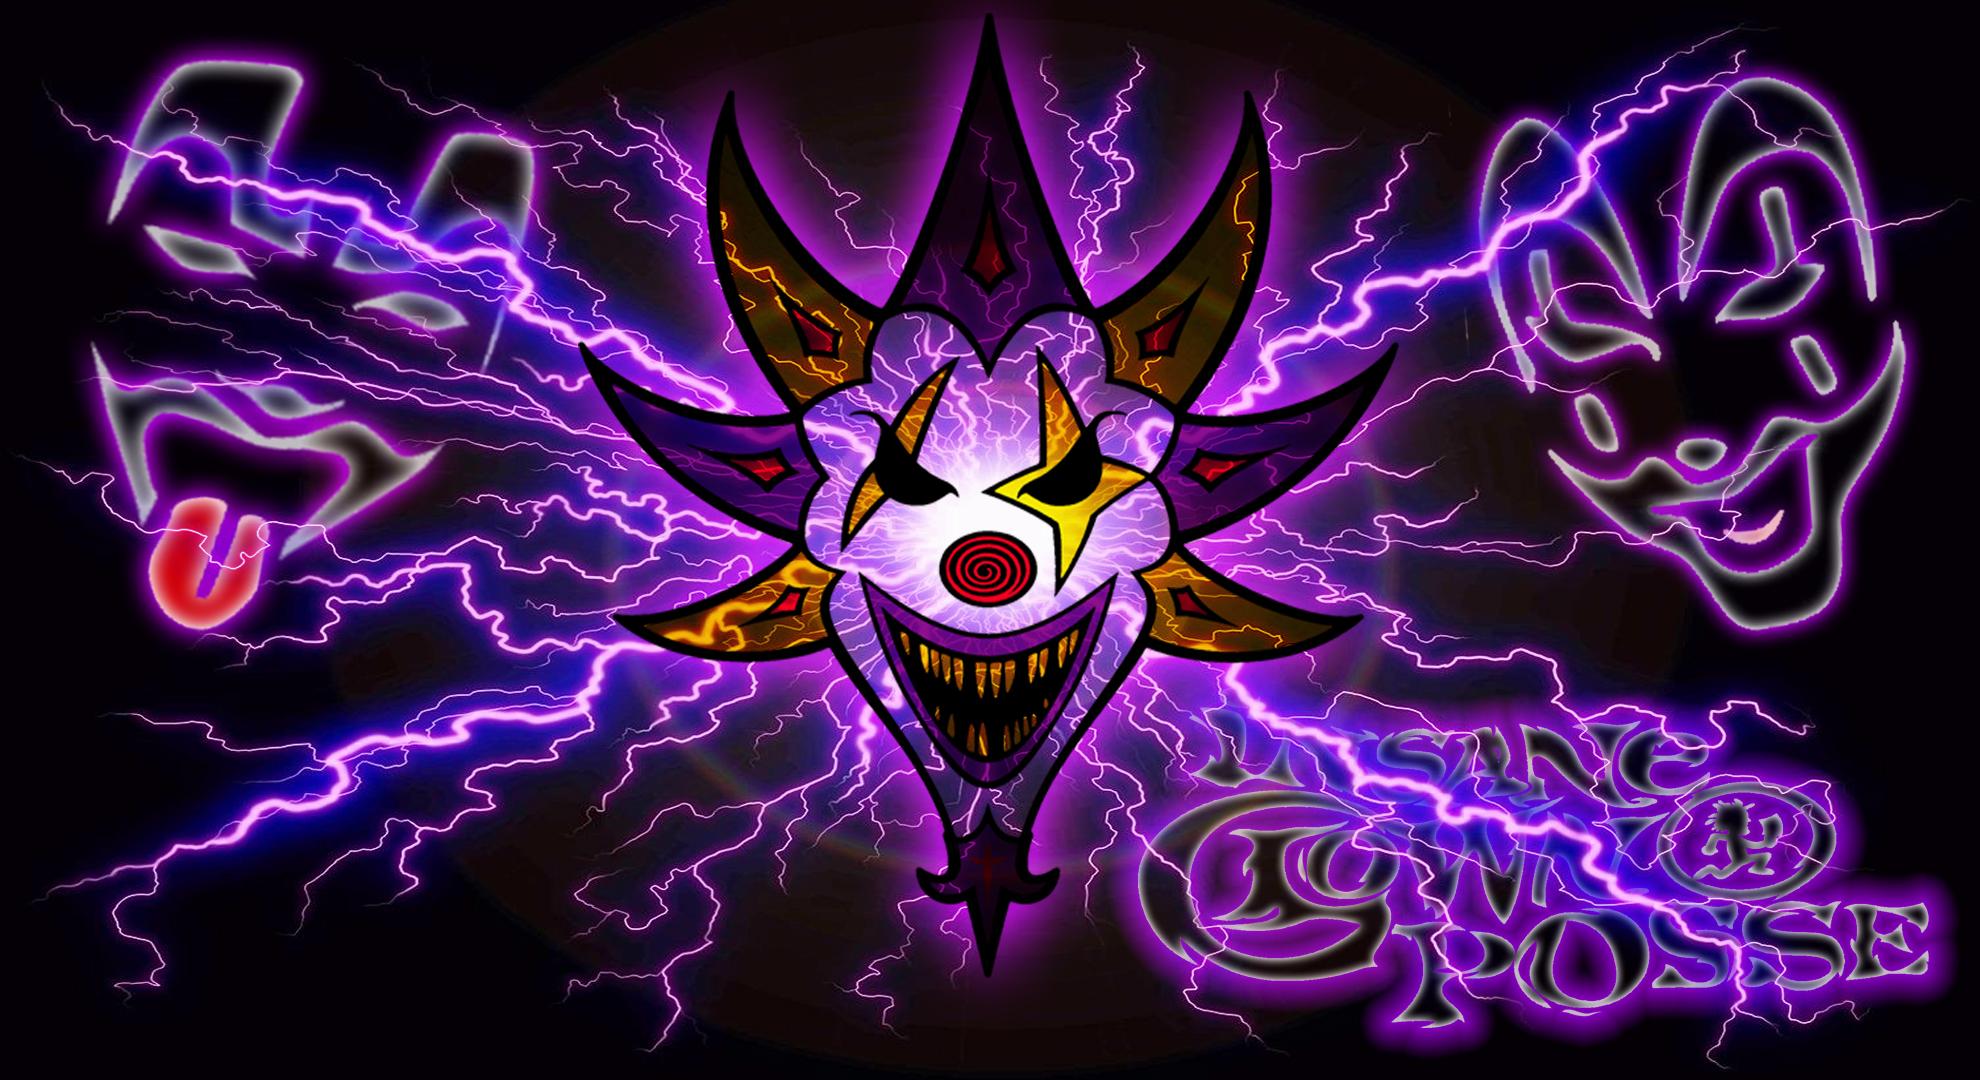 ICP Mighty Death Pop Lightning | Faygoluvers